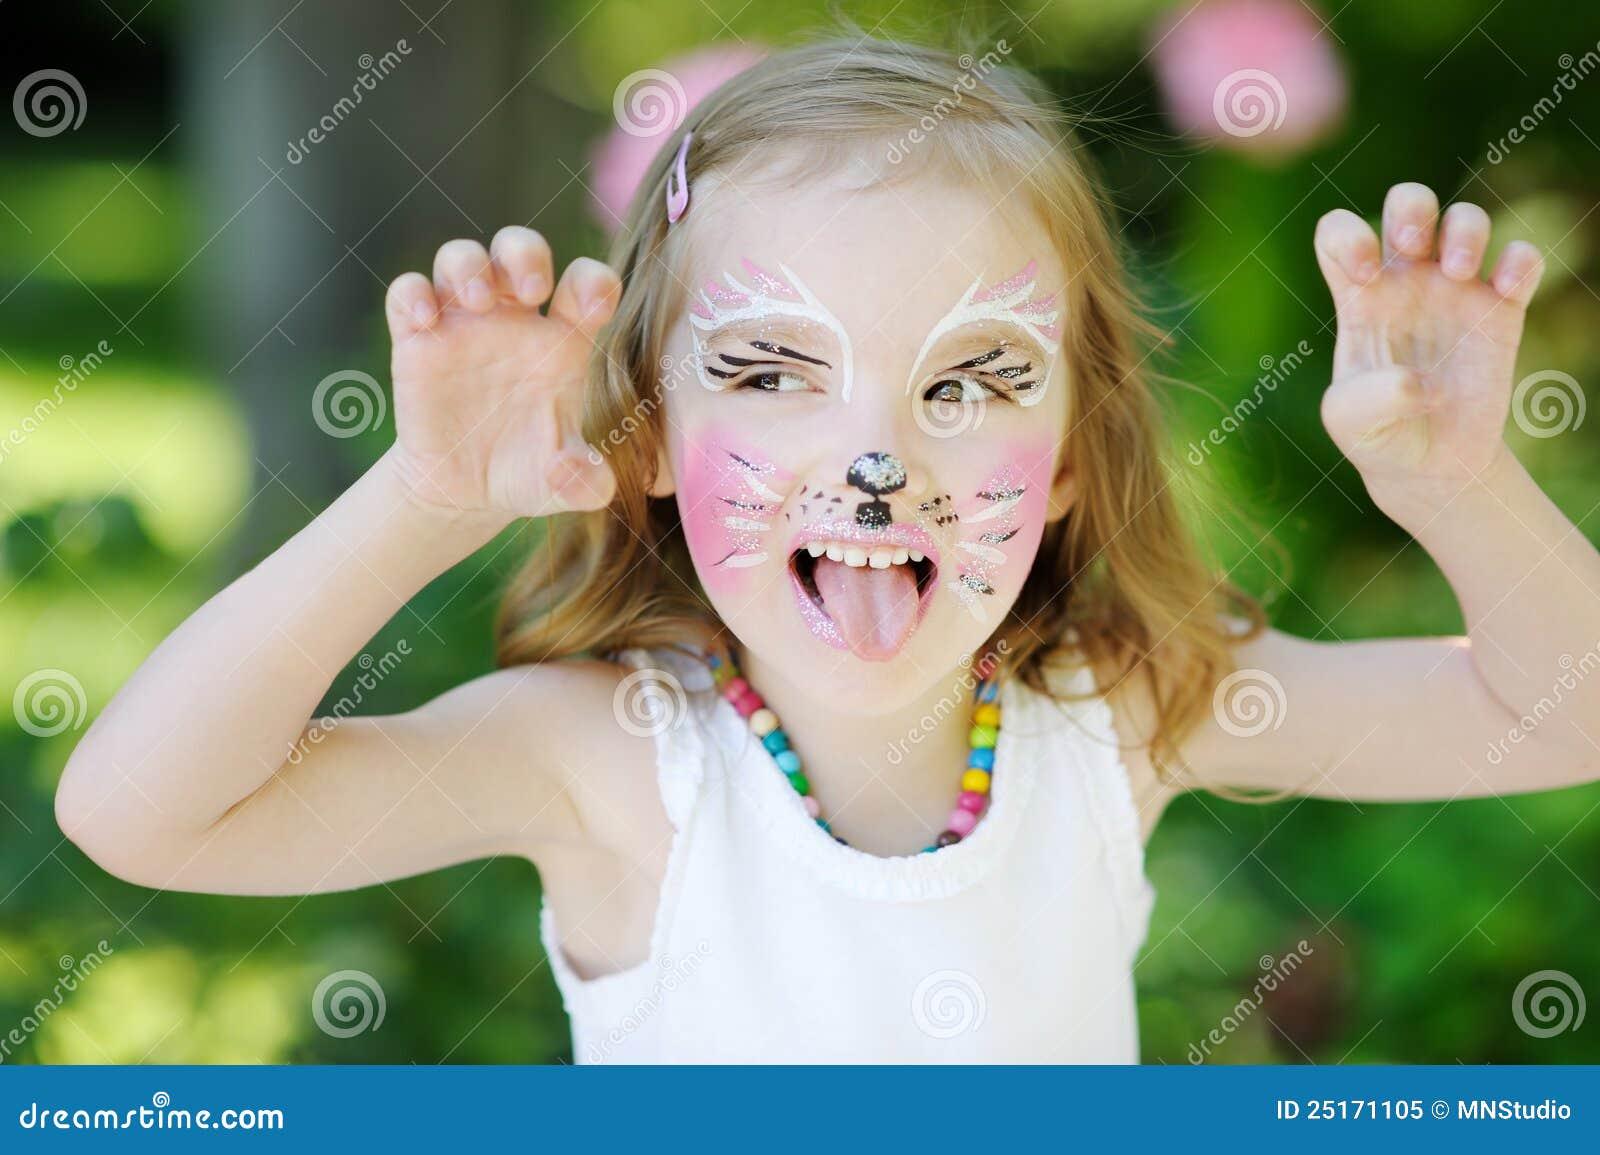 Niña Adorable Con Su Cara Pintada Imagen de archivo - Imagen de ...